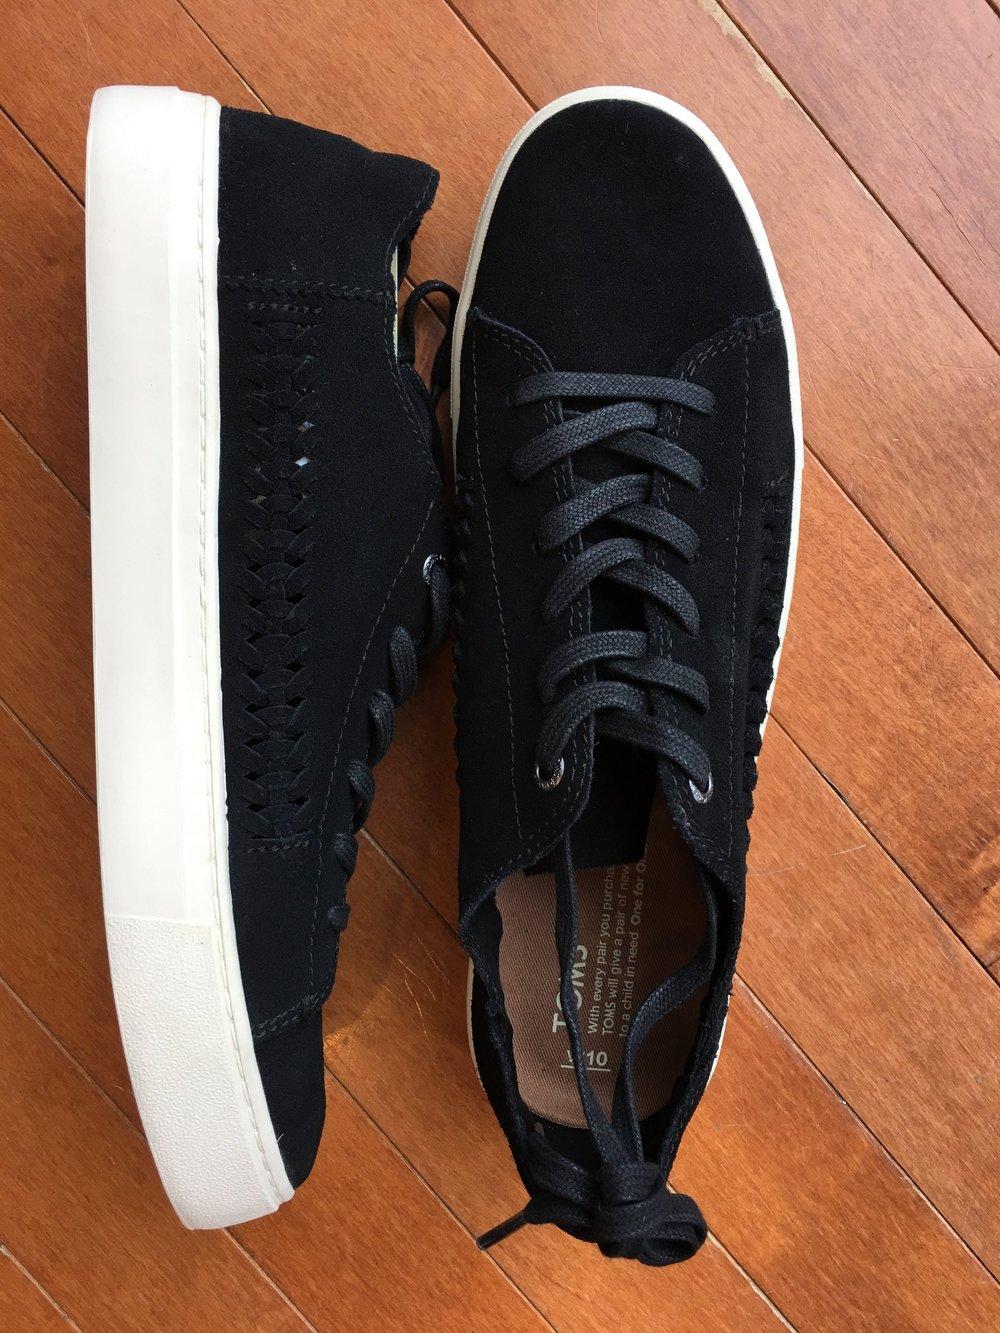 Tom's Lenox sneaker